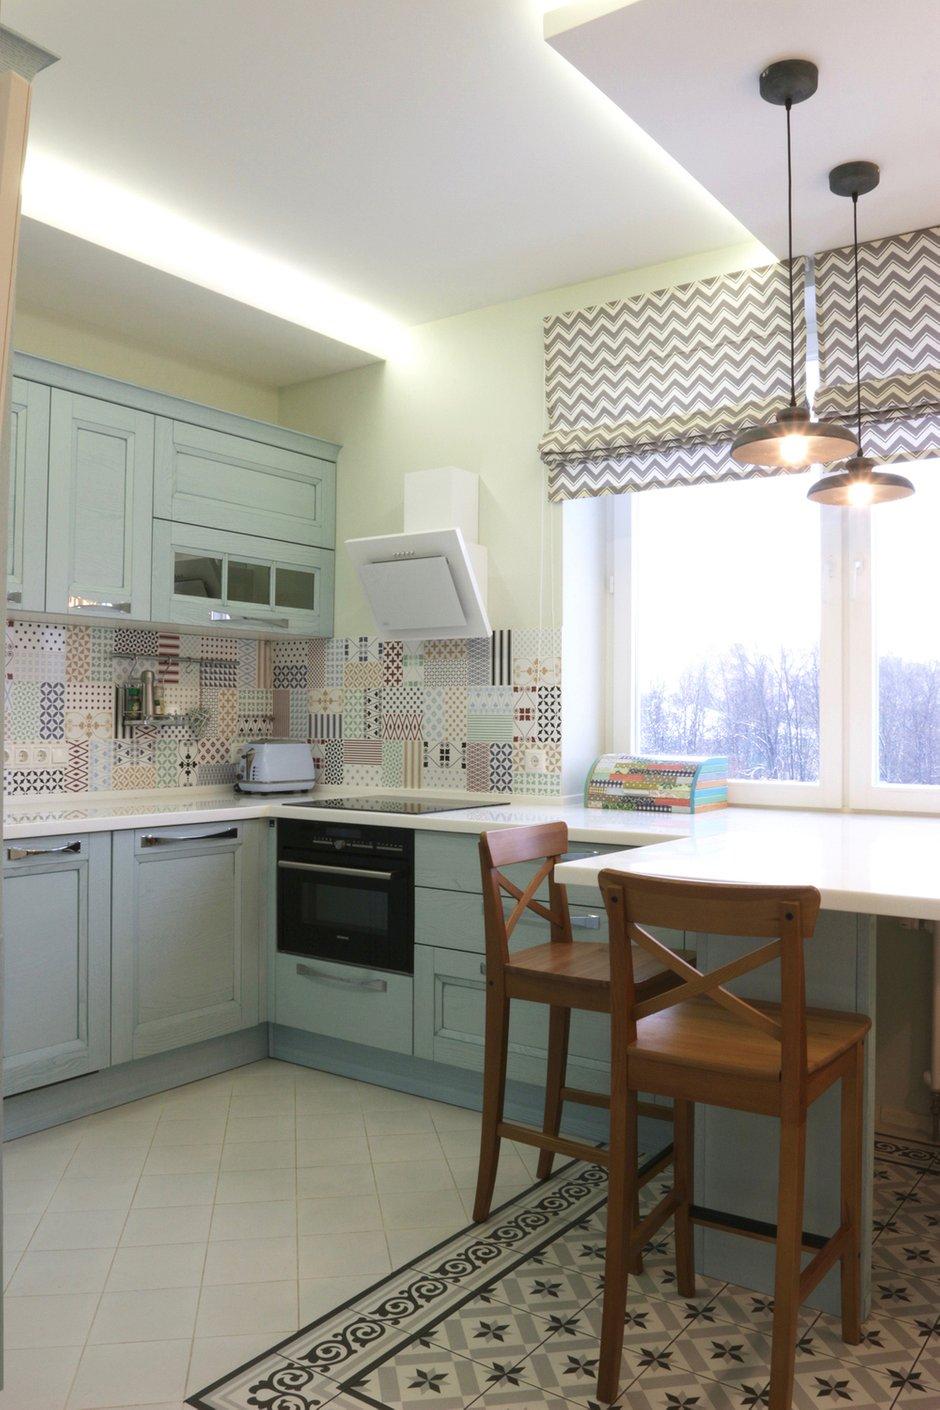 Фотография: Кухня и столовая в стиле Скандинавский, Квартира, Проект недели, Химки, SPACE4LIFE – фото на INMYROOM